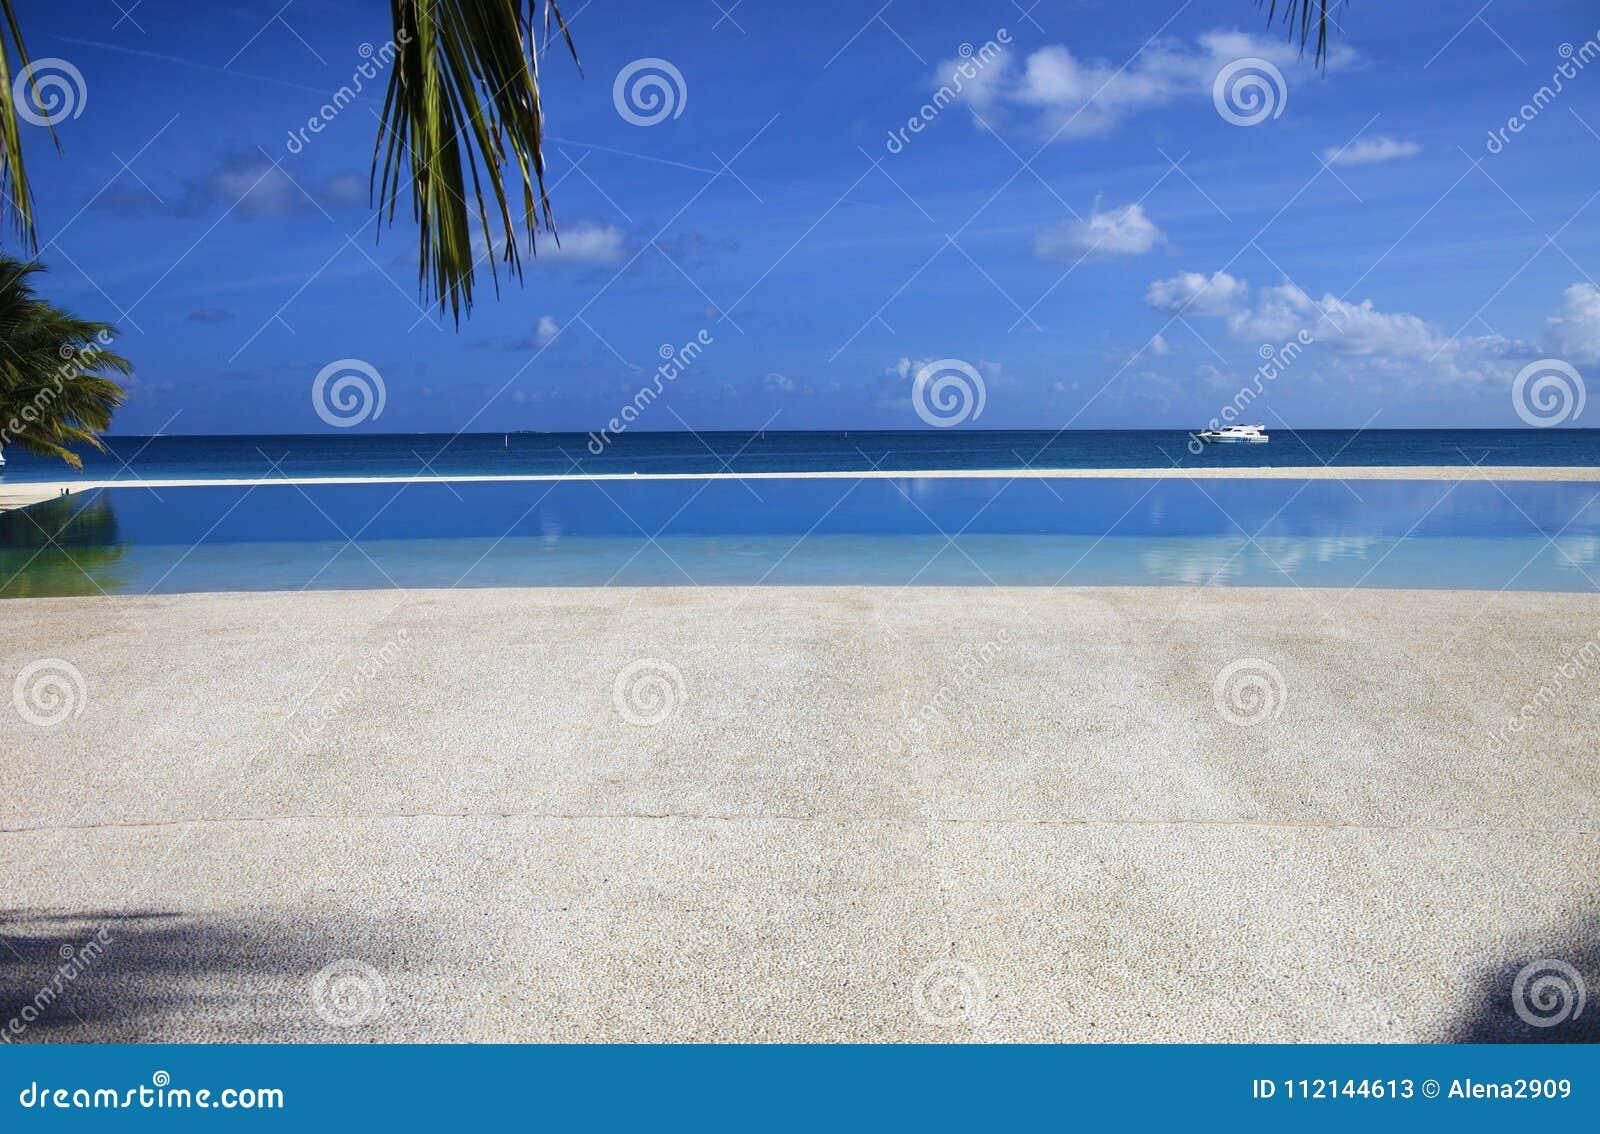 Infinite swimming pool stock image. Image of background - 112144613